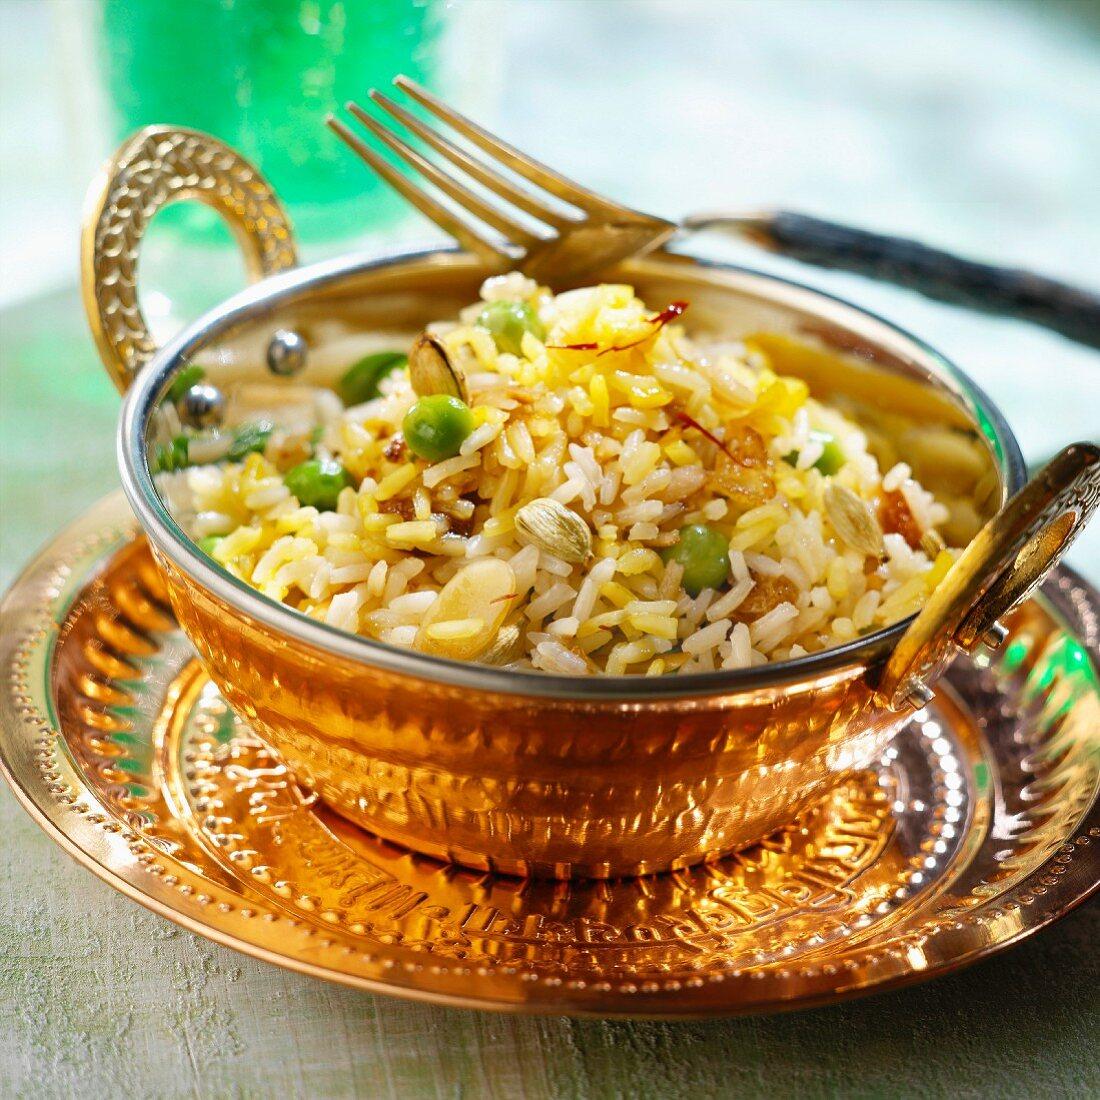 Biryani rice with cardamom, saffron, raisins, peas and almonds